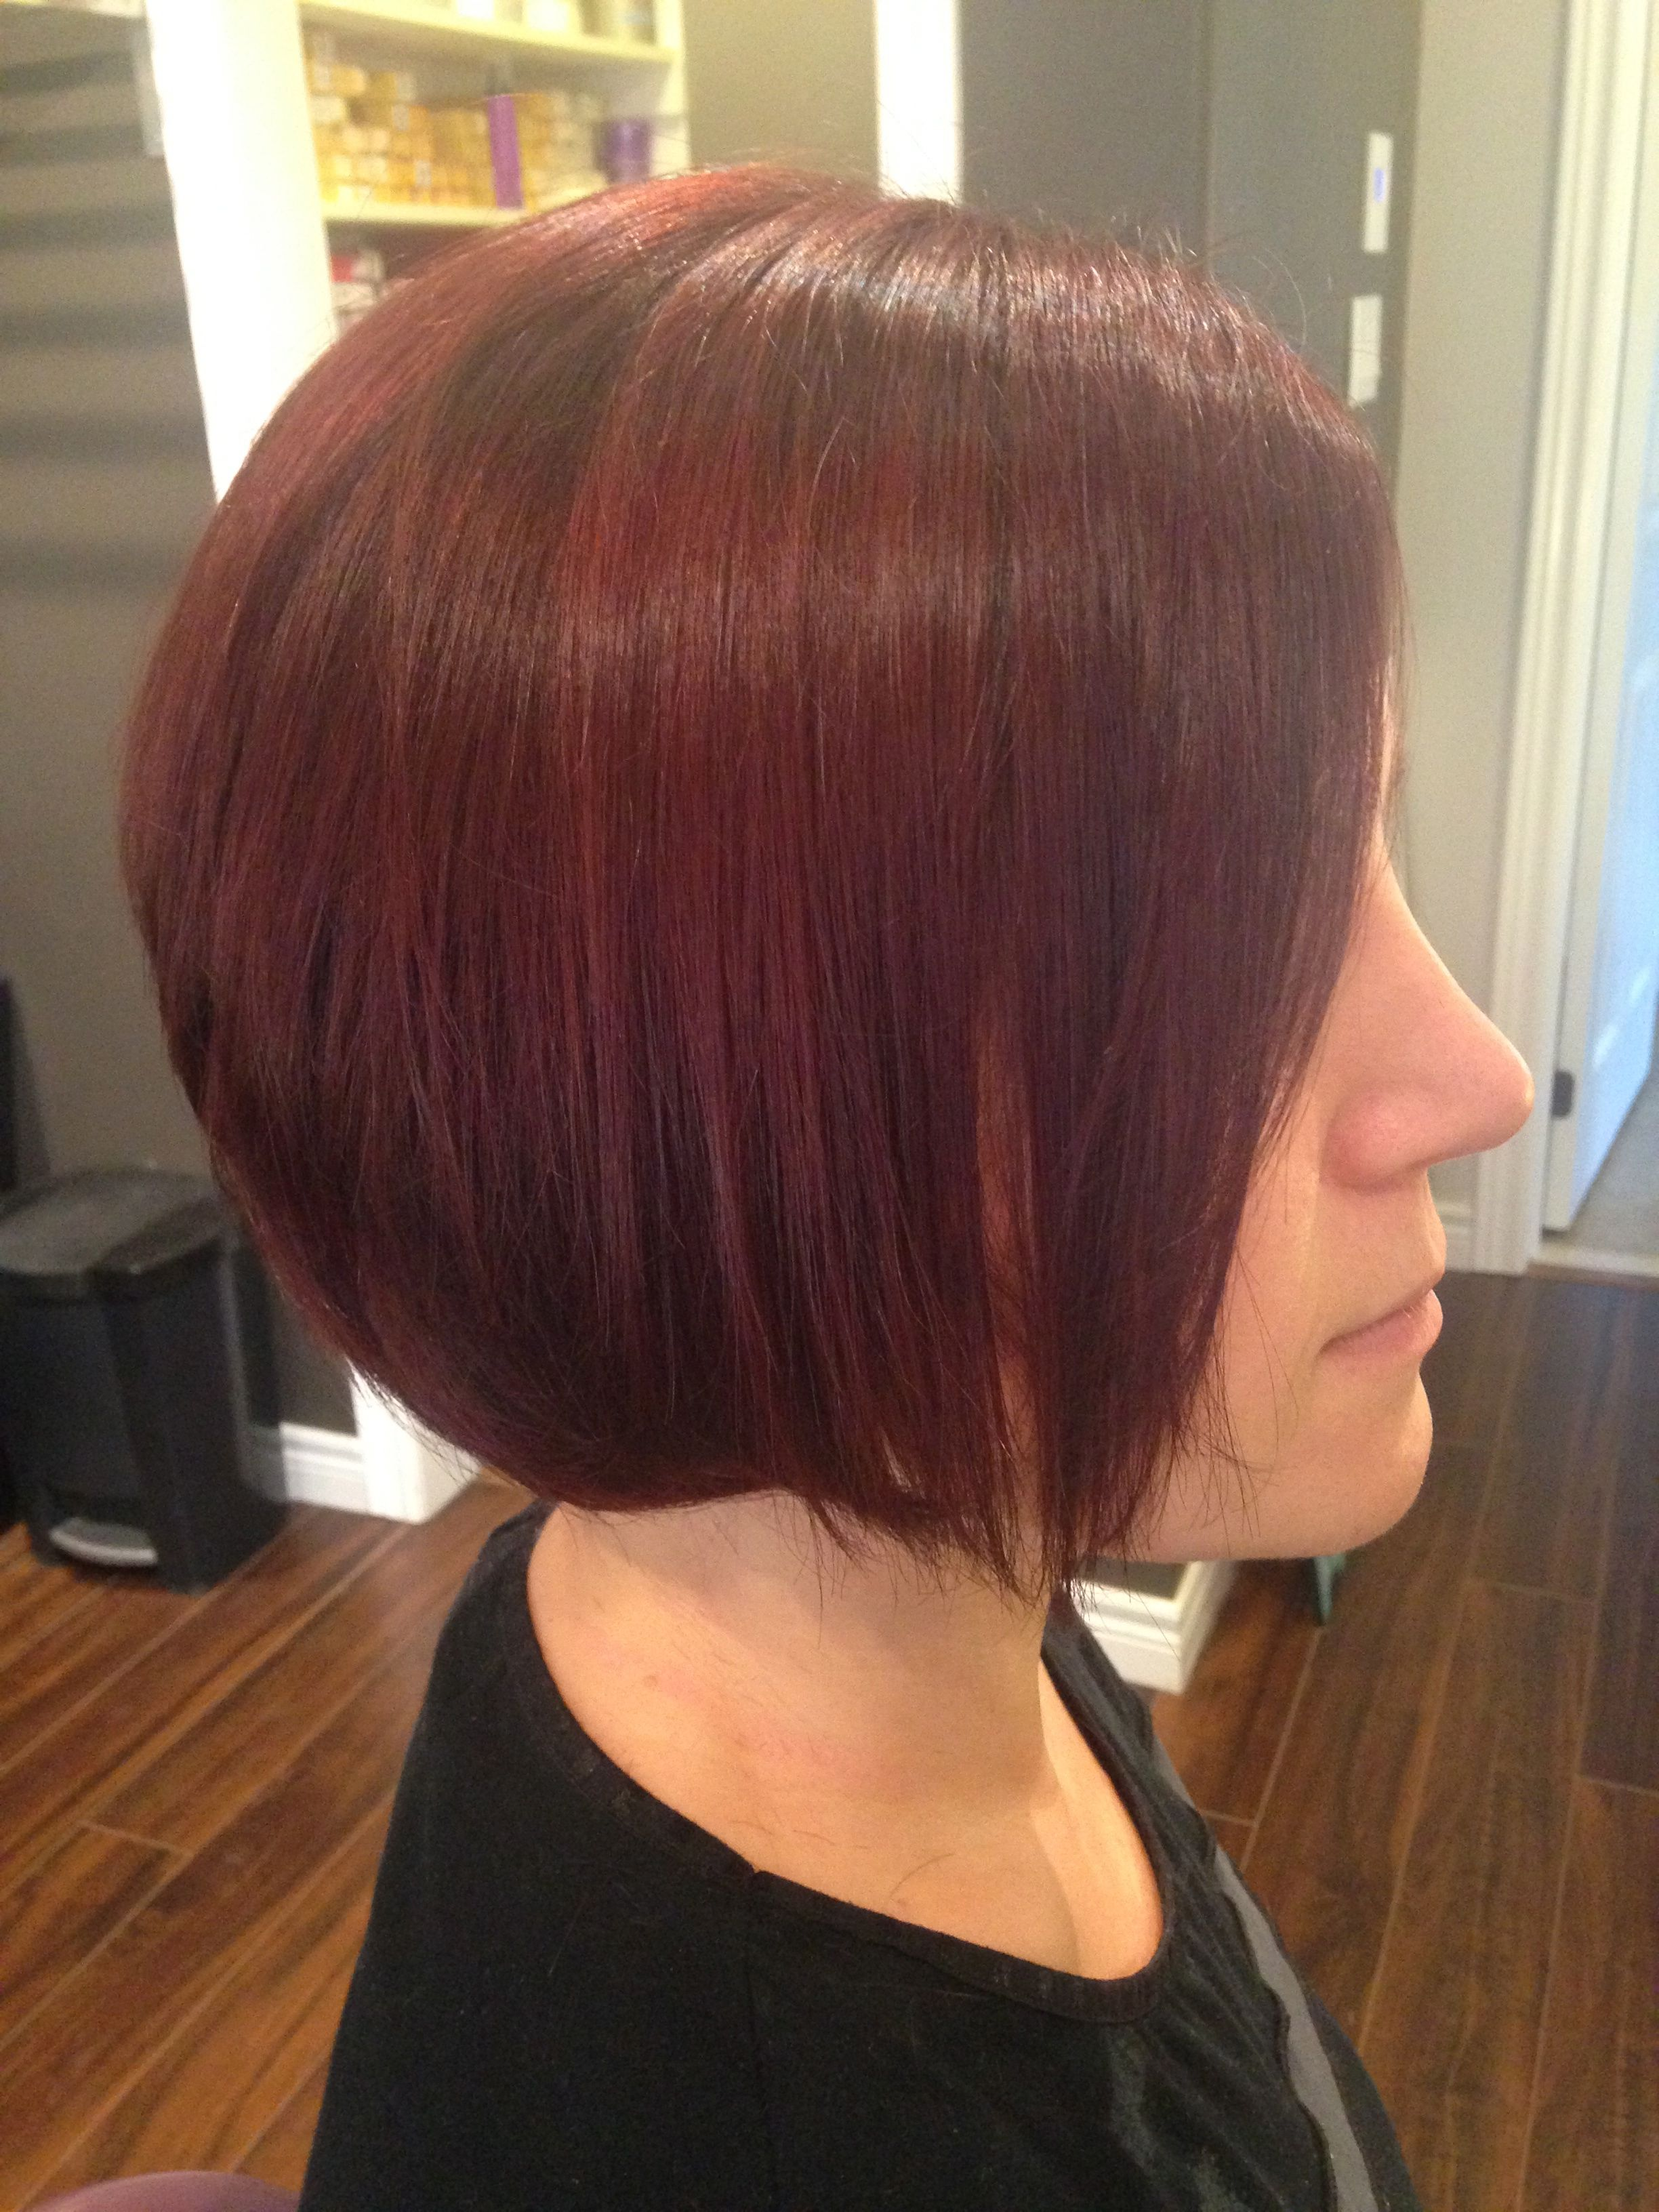 Red Hair Bob Bob hairstyles Pinterest